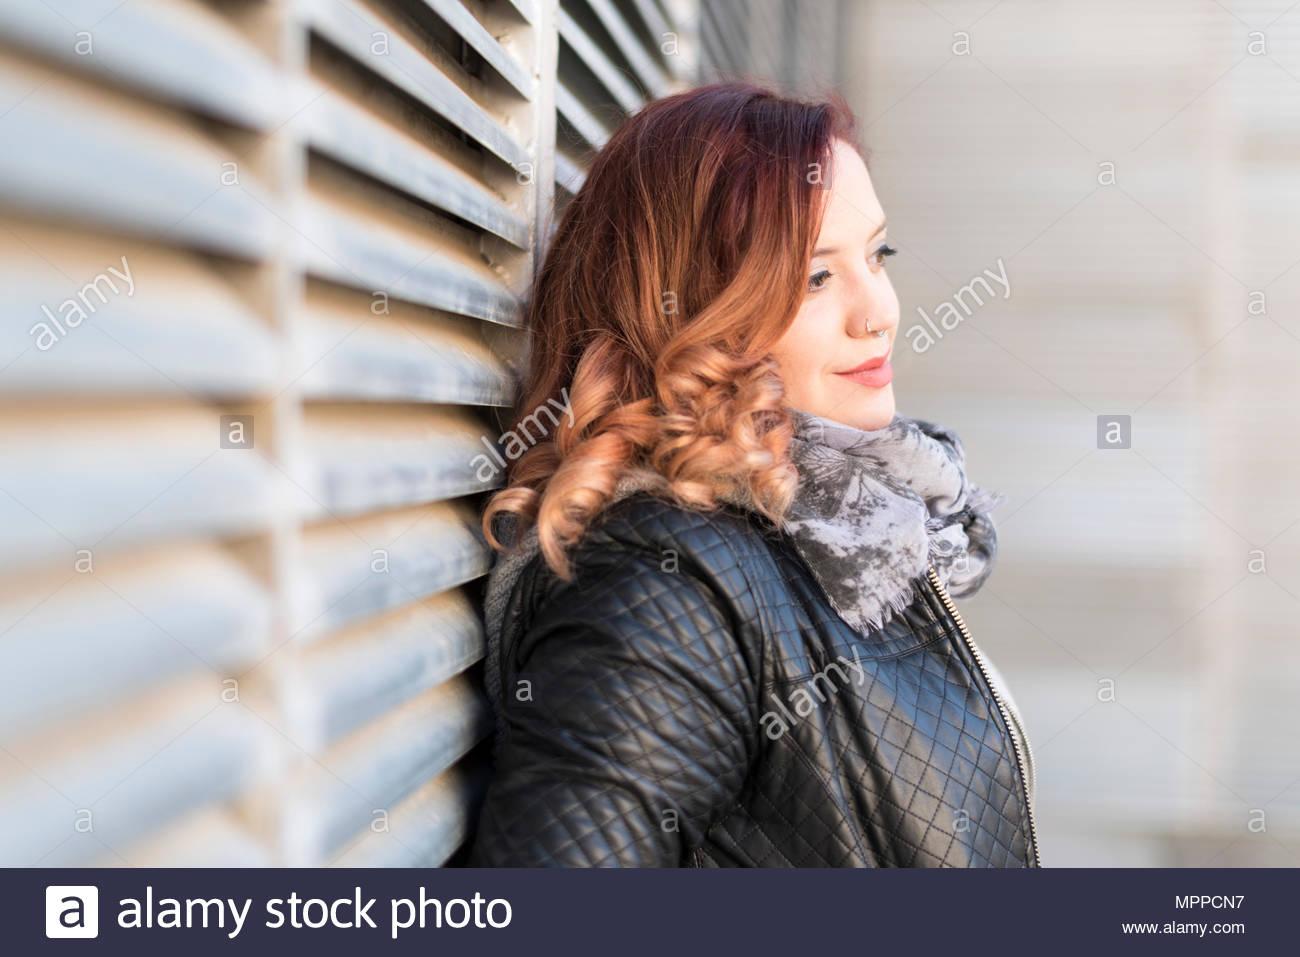 Tagträumen Frau mit lockigem Haar und Nasenpiercing Stockbild